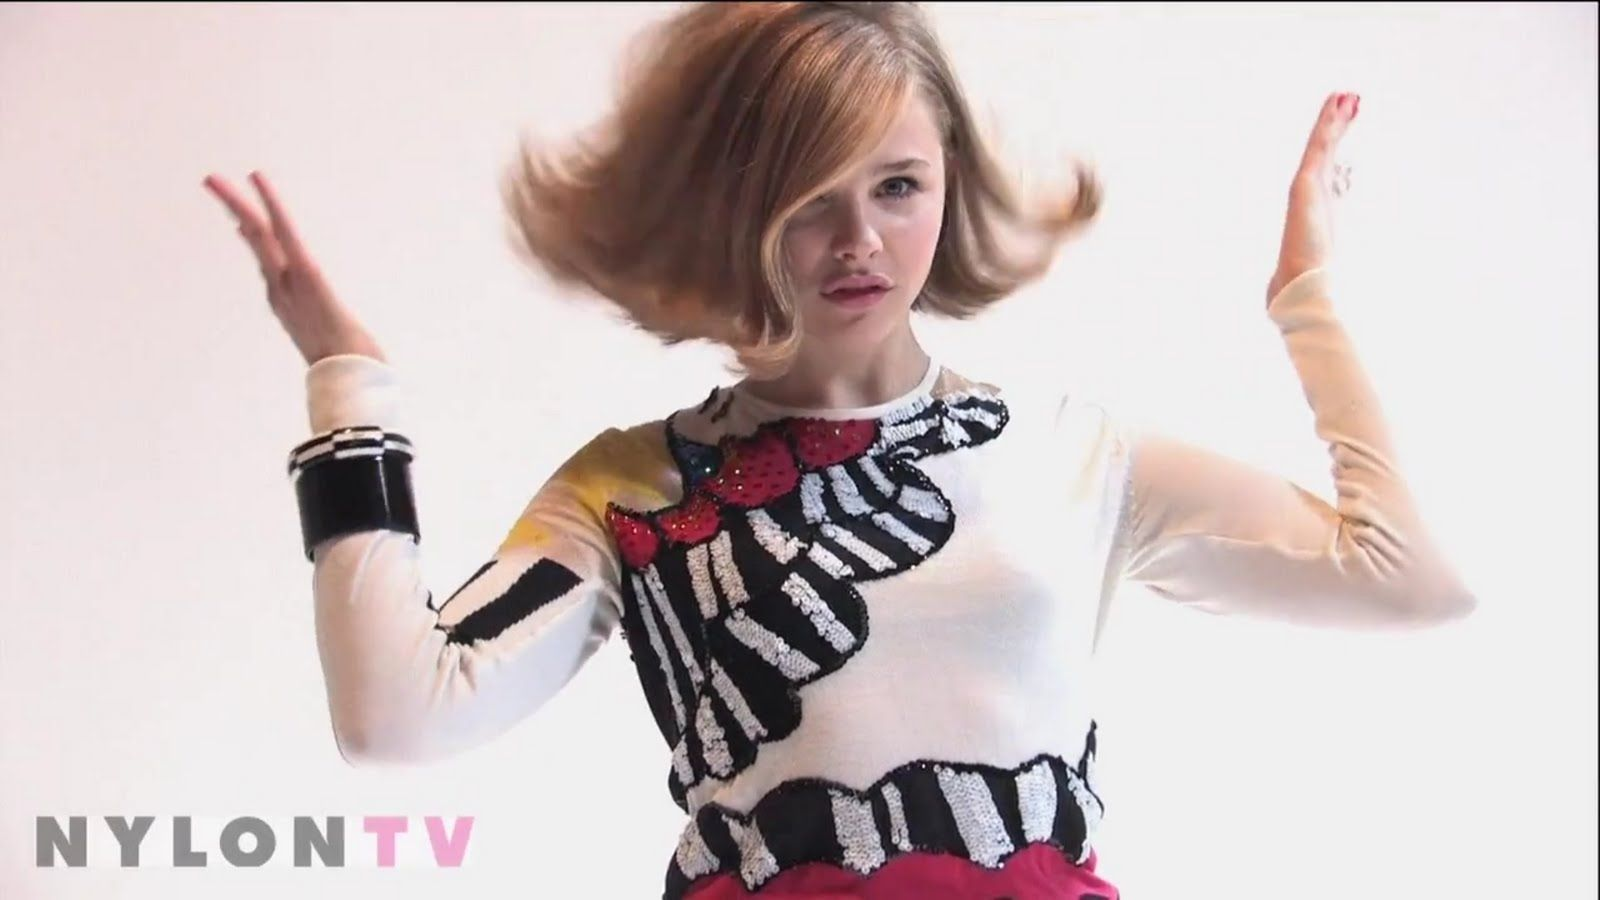 Chloe Moretz for Nylon #fashion #editorial #photography #celebs